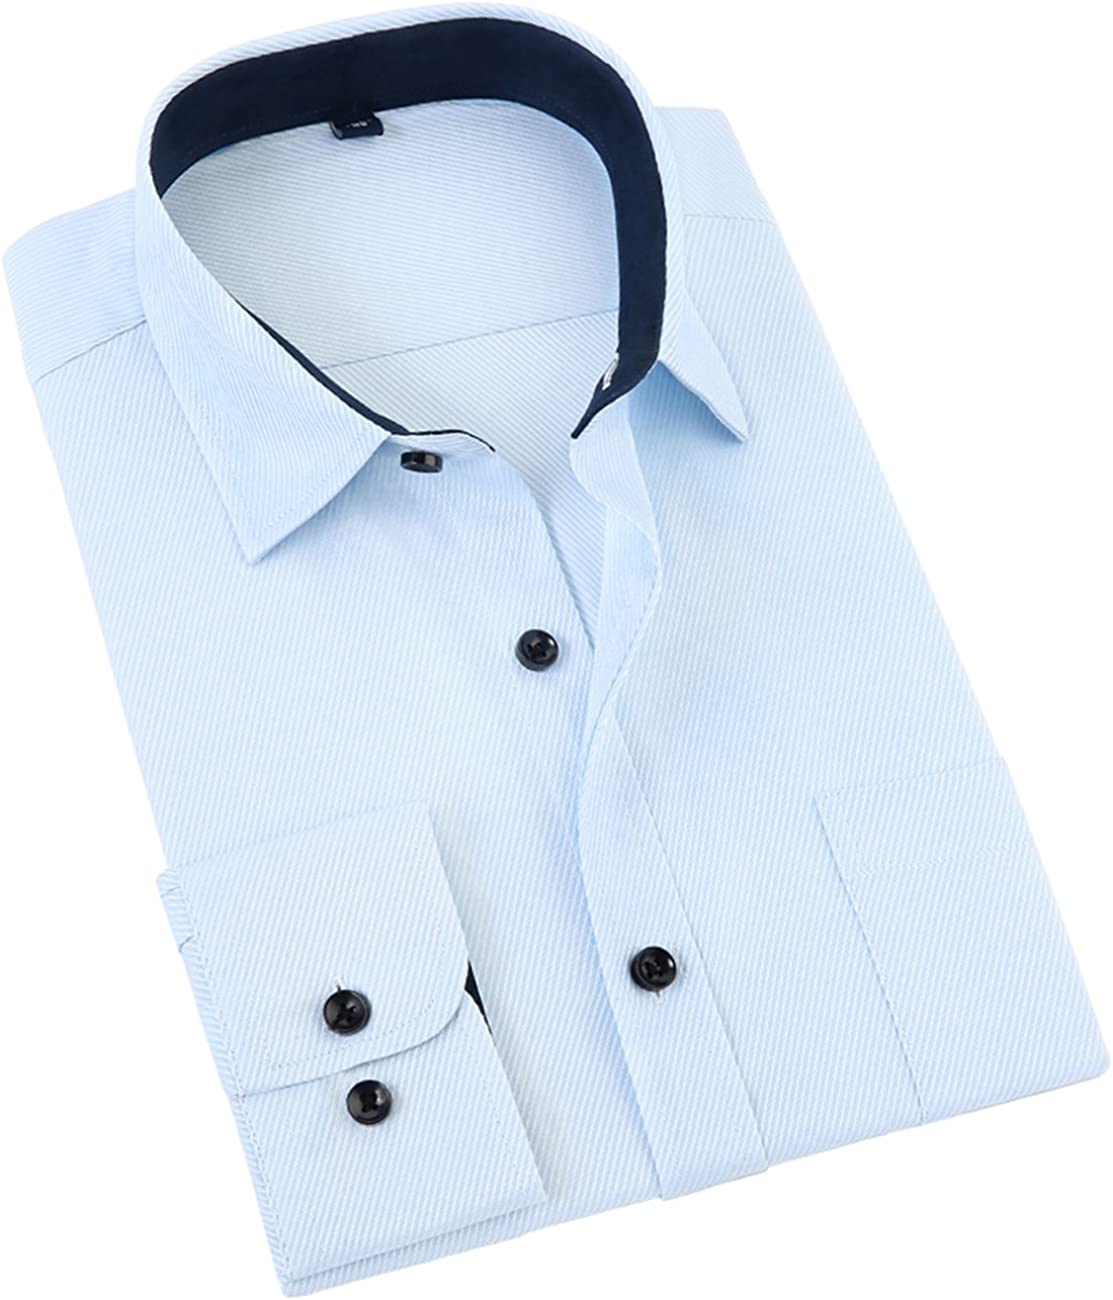 JEETOO® Camisas Rayas Oblicuas de Hombre Manga Larga Slim Fit ...